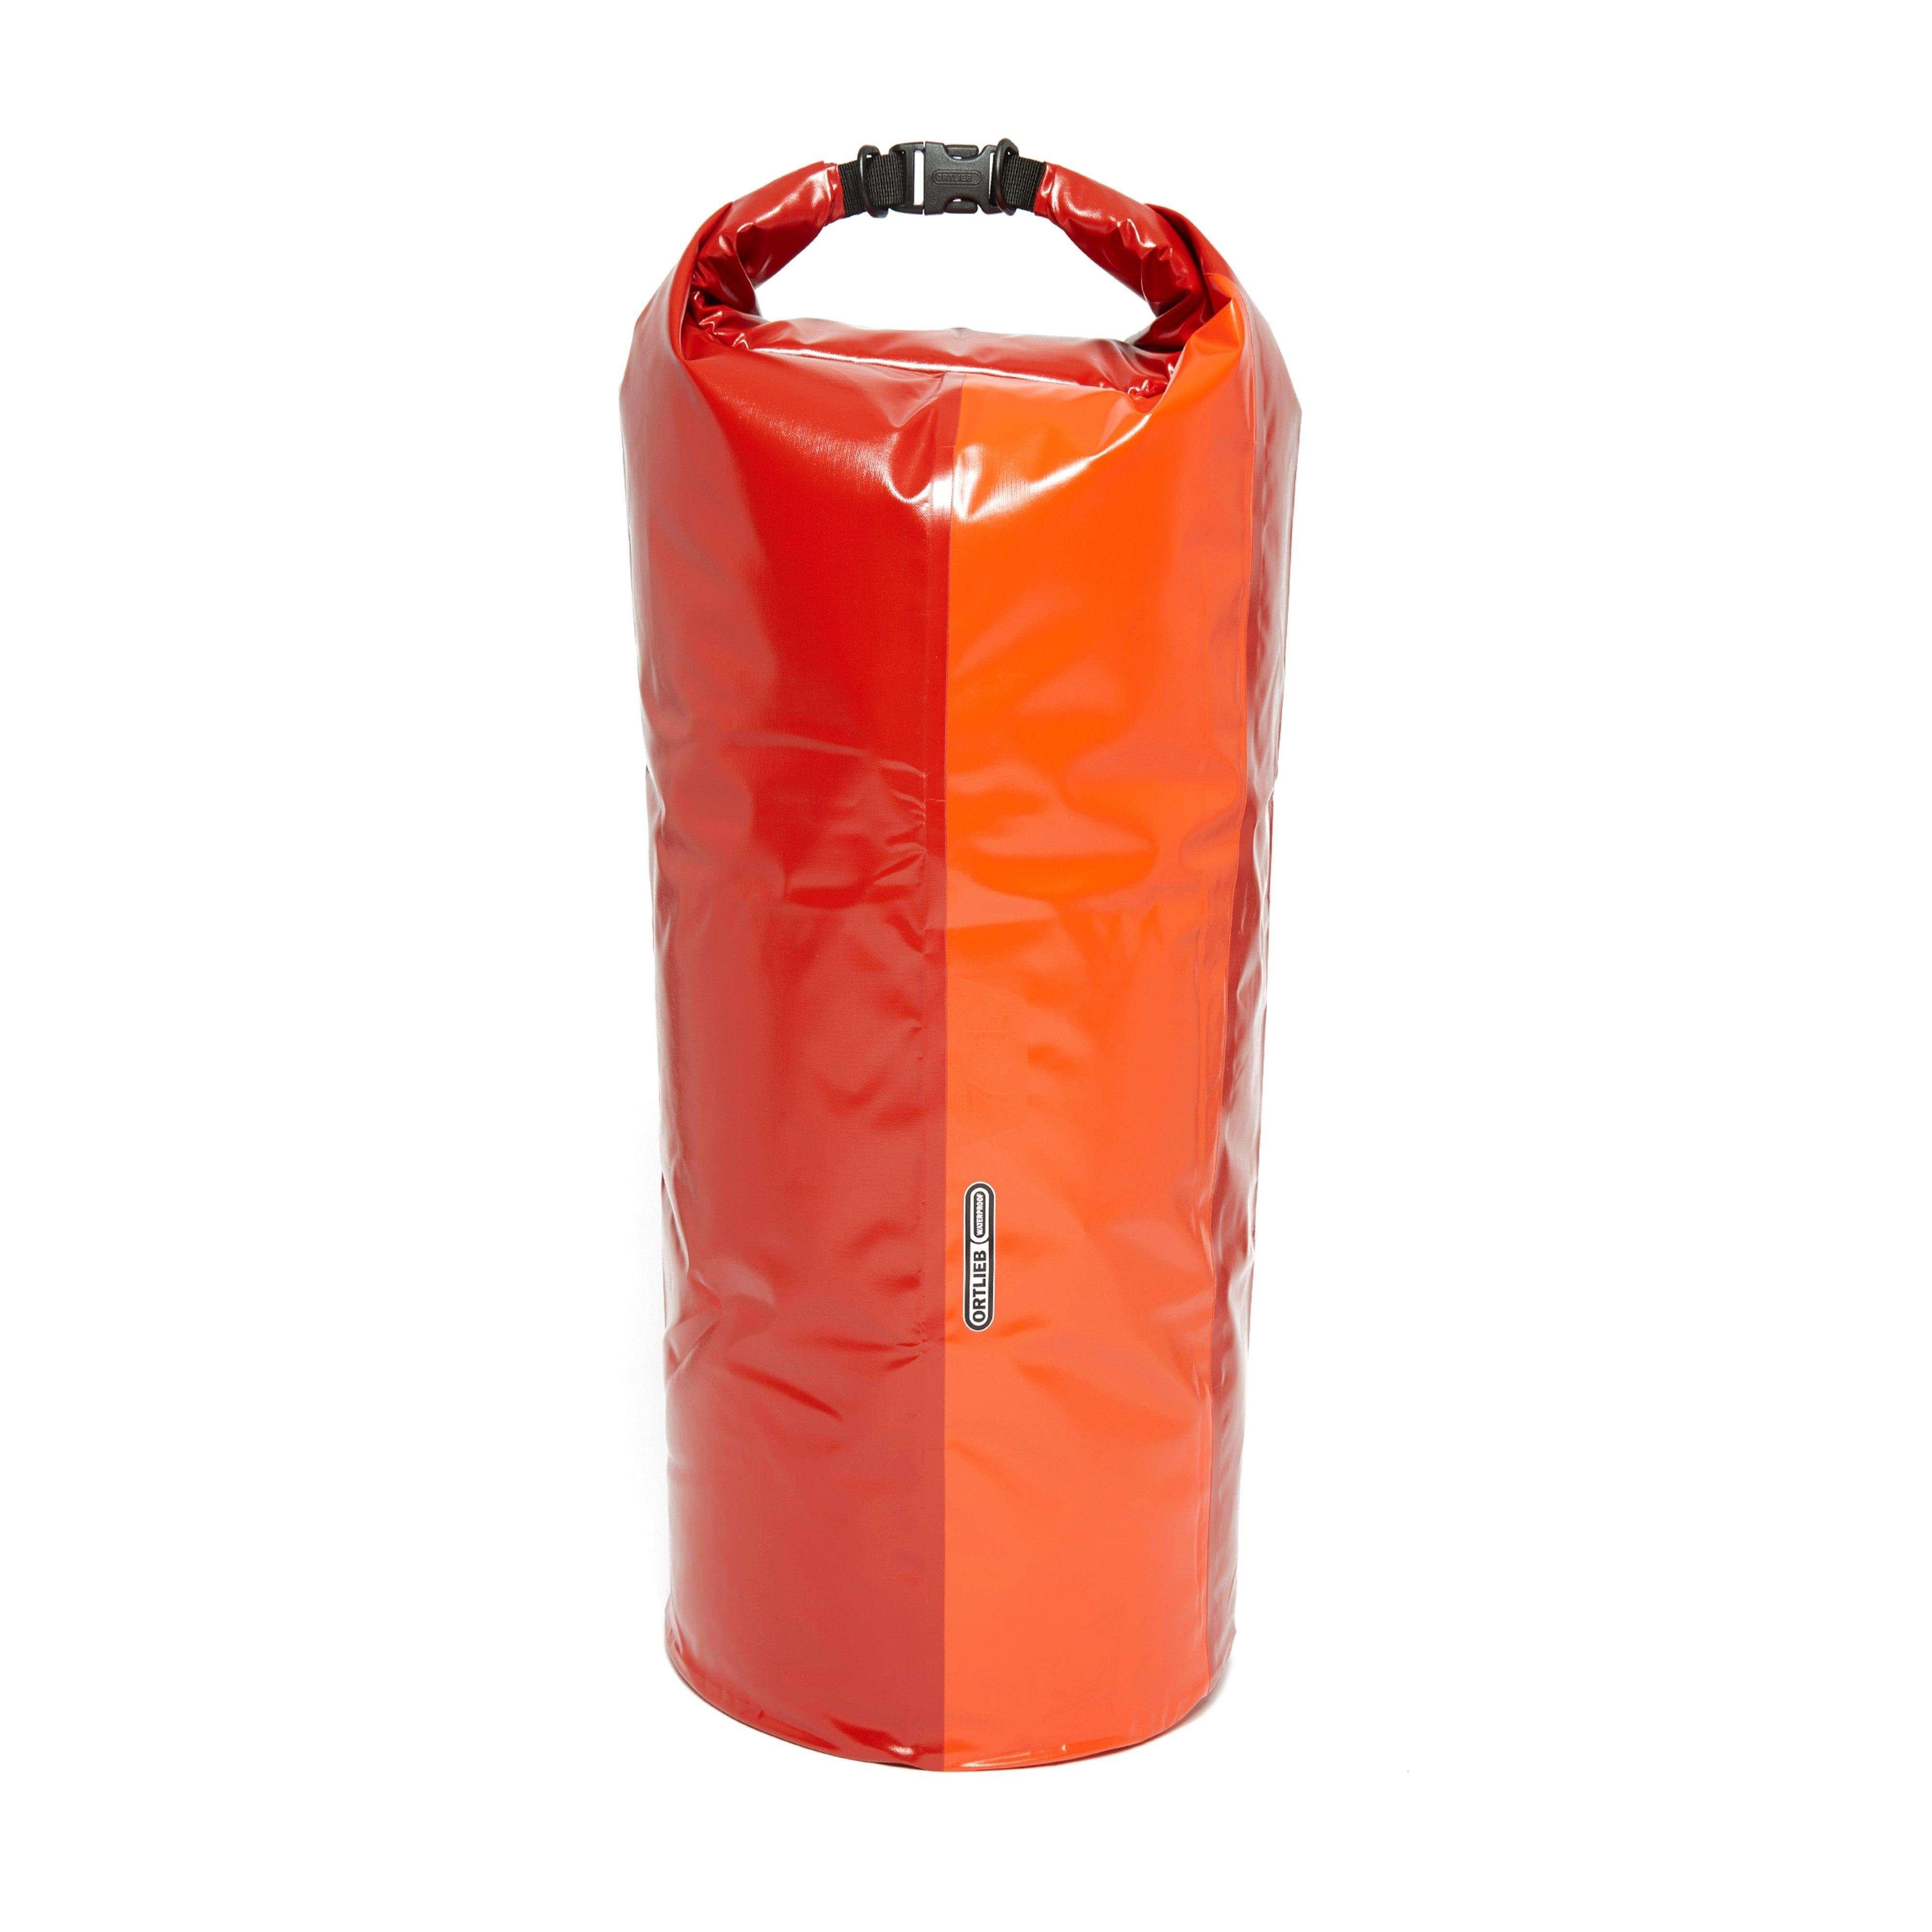 ORTLIEB Medium Weight 79L Drybag